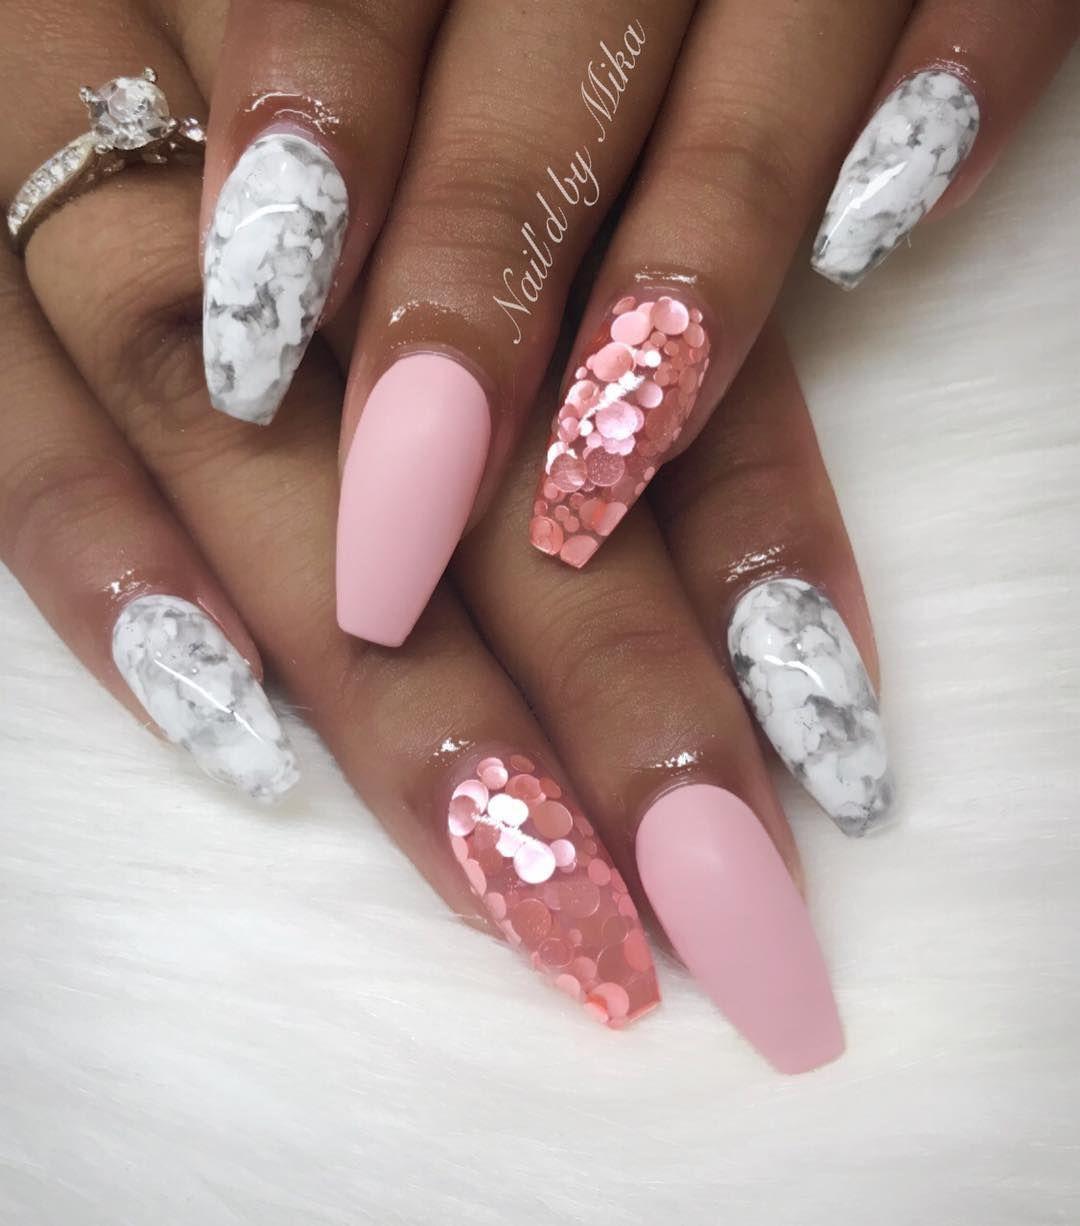 Pin by Valerie Okeefe on fancy nails rhinestones   Pinterest ...